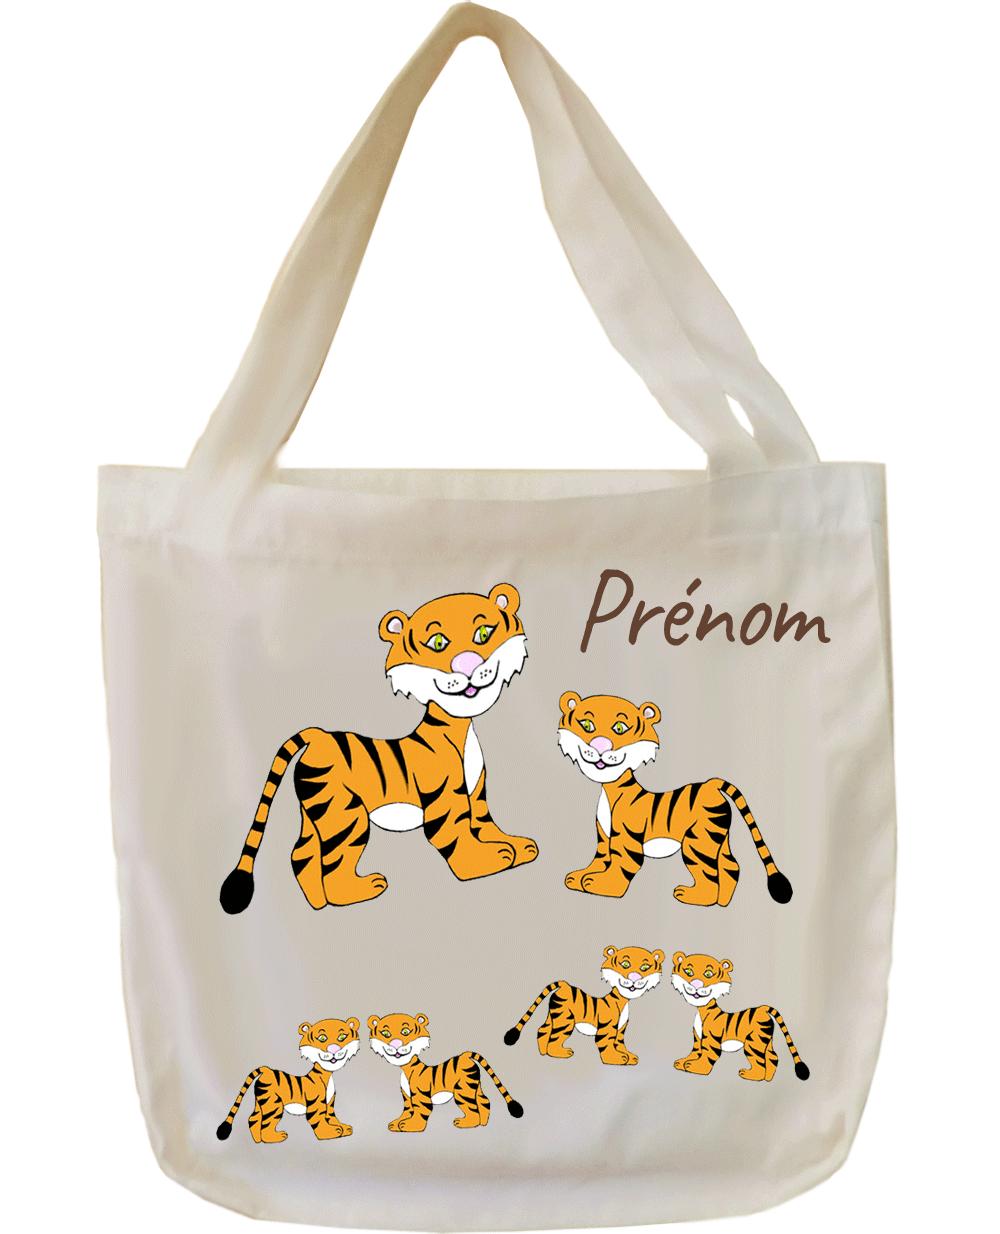 tote-bag;sac;cabas;texti;cadeaux;personnalisable;personnalisation;personnalise;prenom;animal;tigre